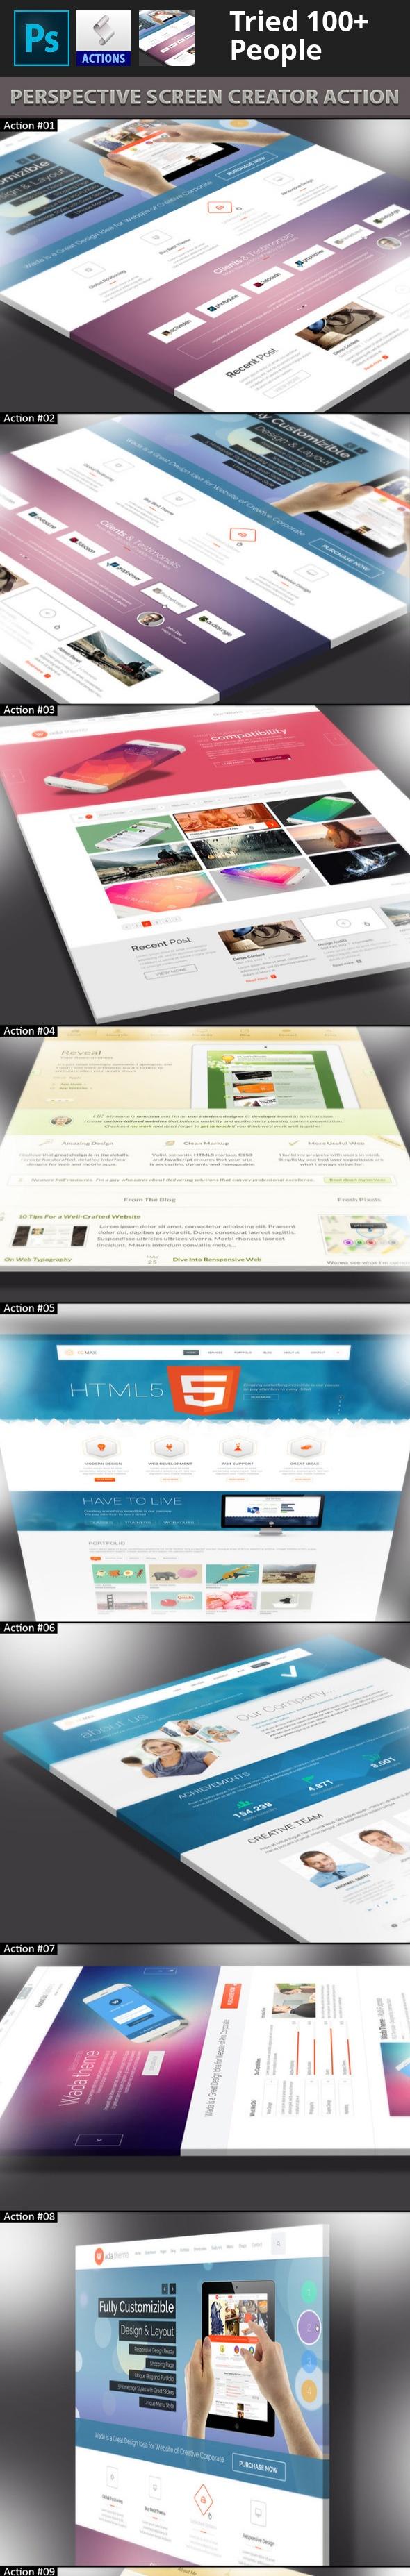 3d, 3d display, 3d view, android, app display, app screen